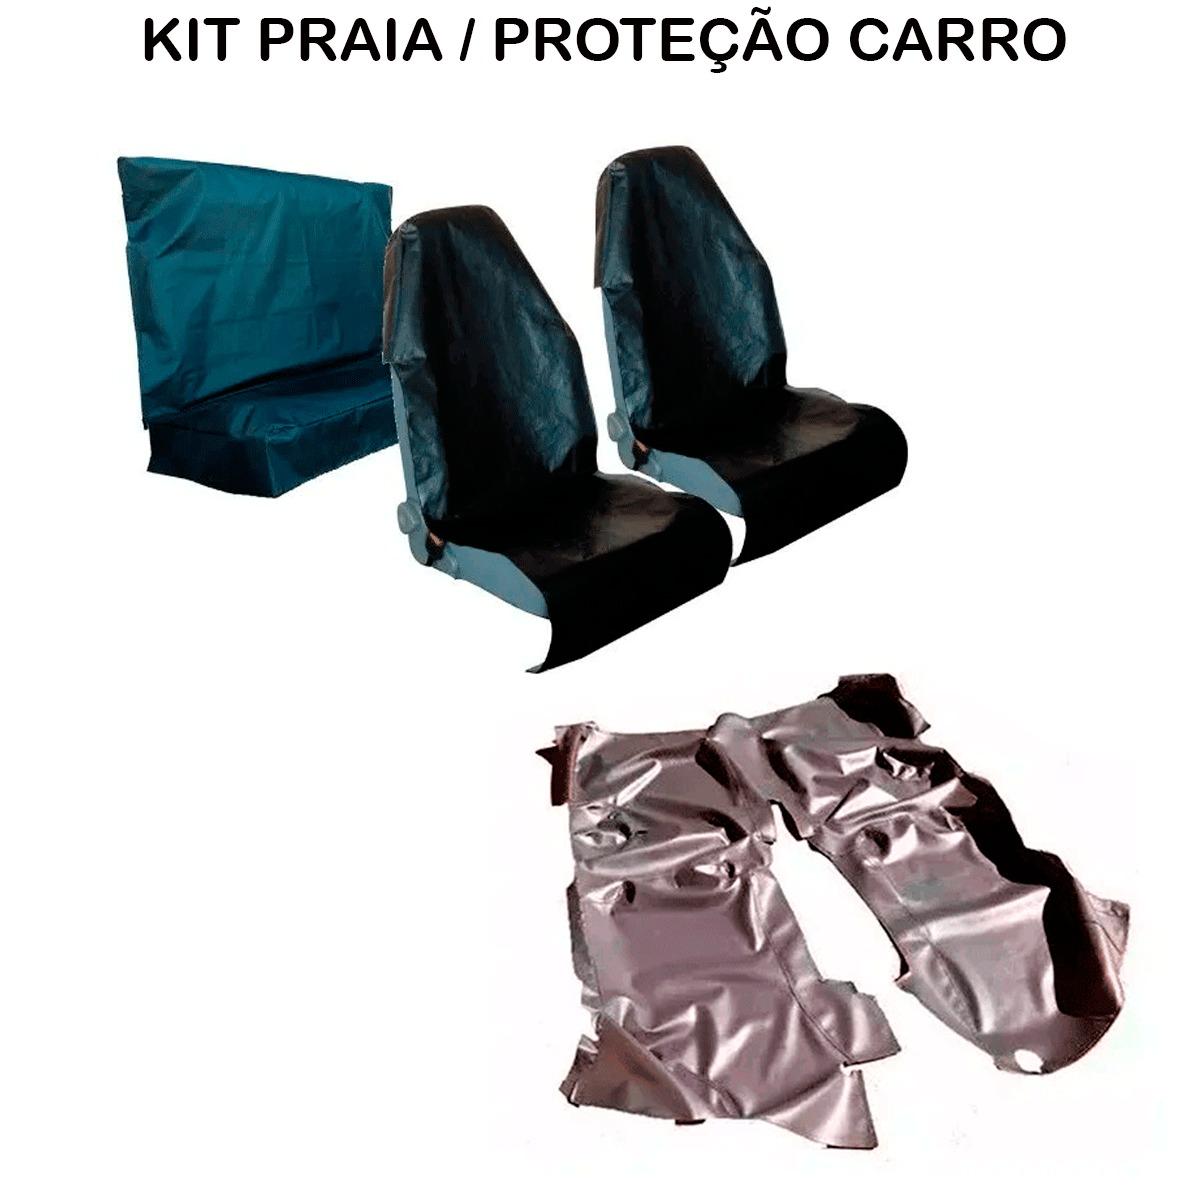 Tapete Em Vinil Renault Duster 2011 a 2014 + Capa Banco Protecao Banco Areia Suor Academia